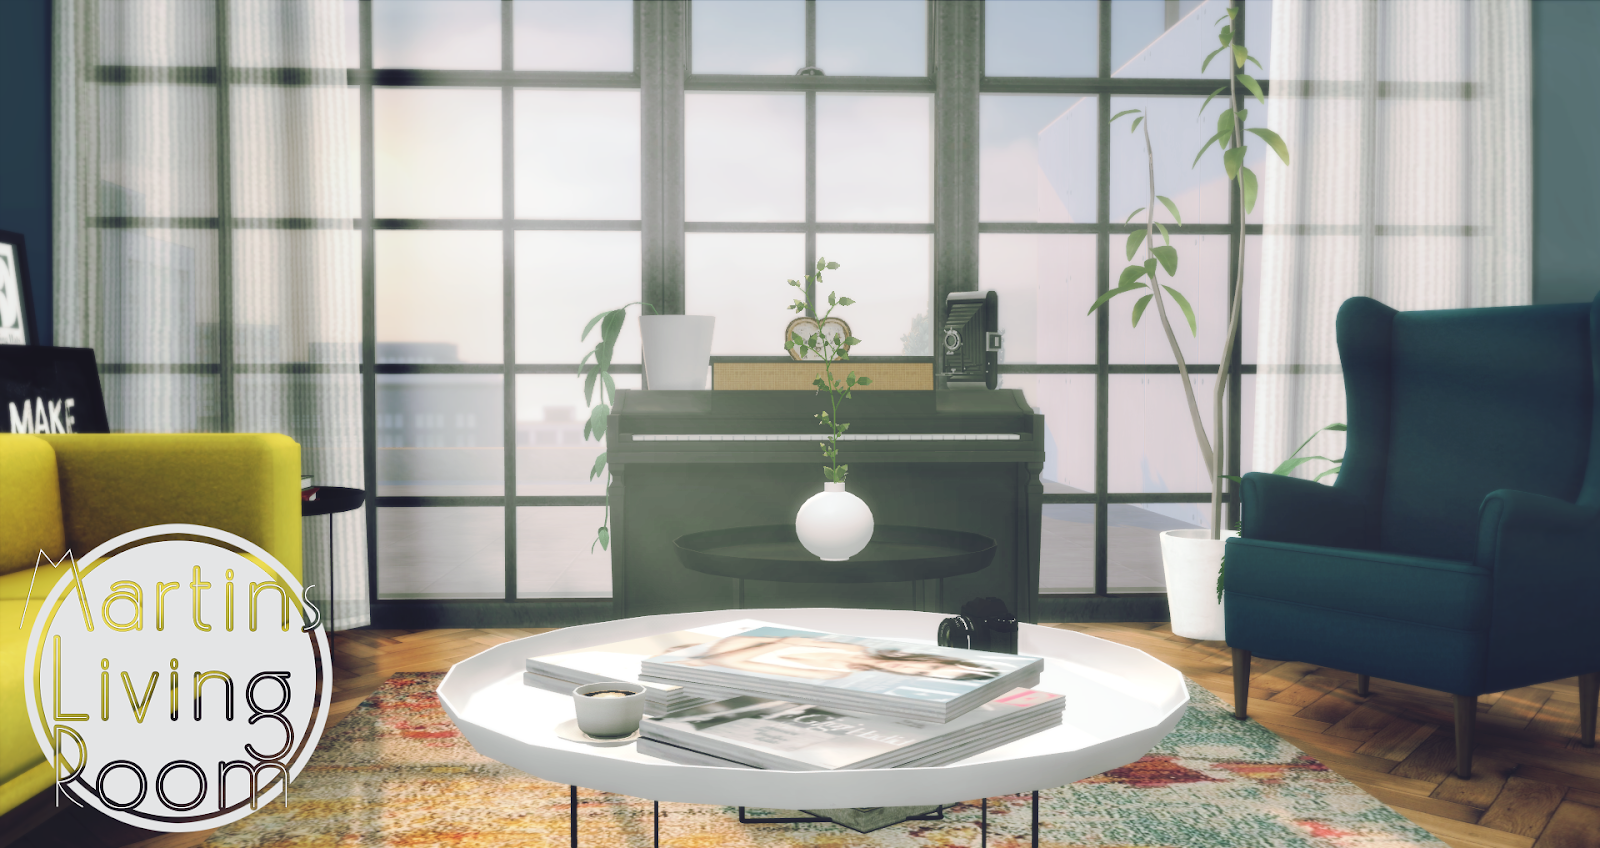 Martins Living Room *NEW SET*